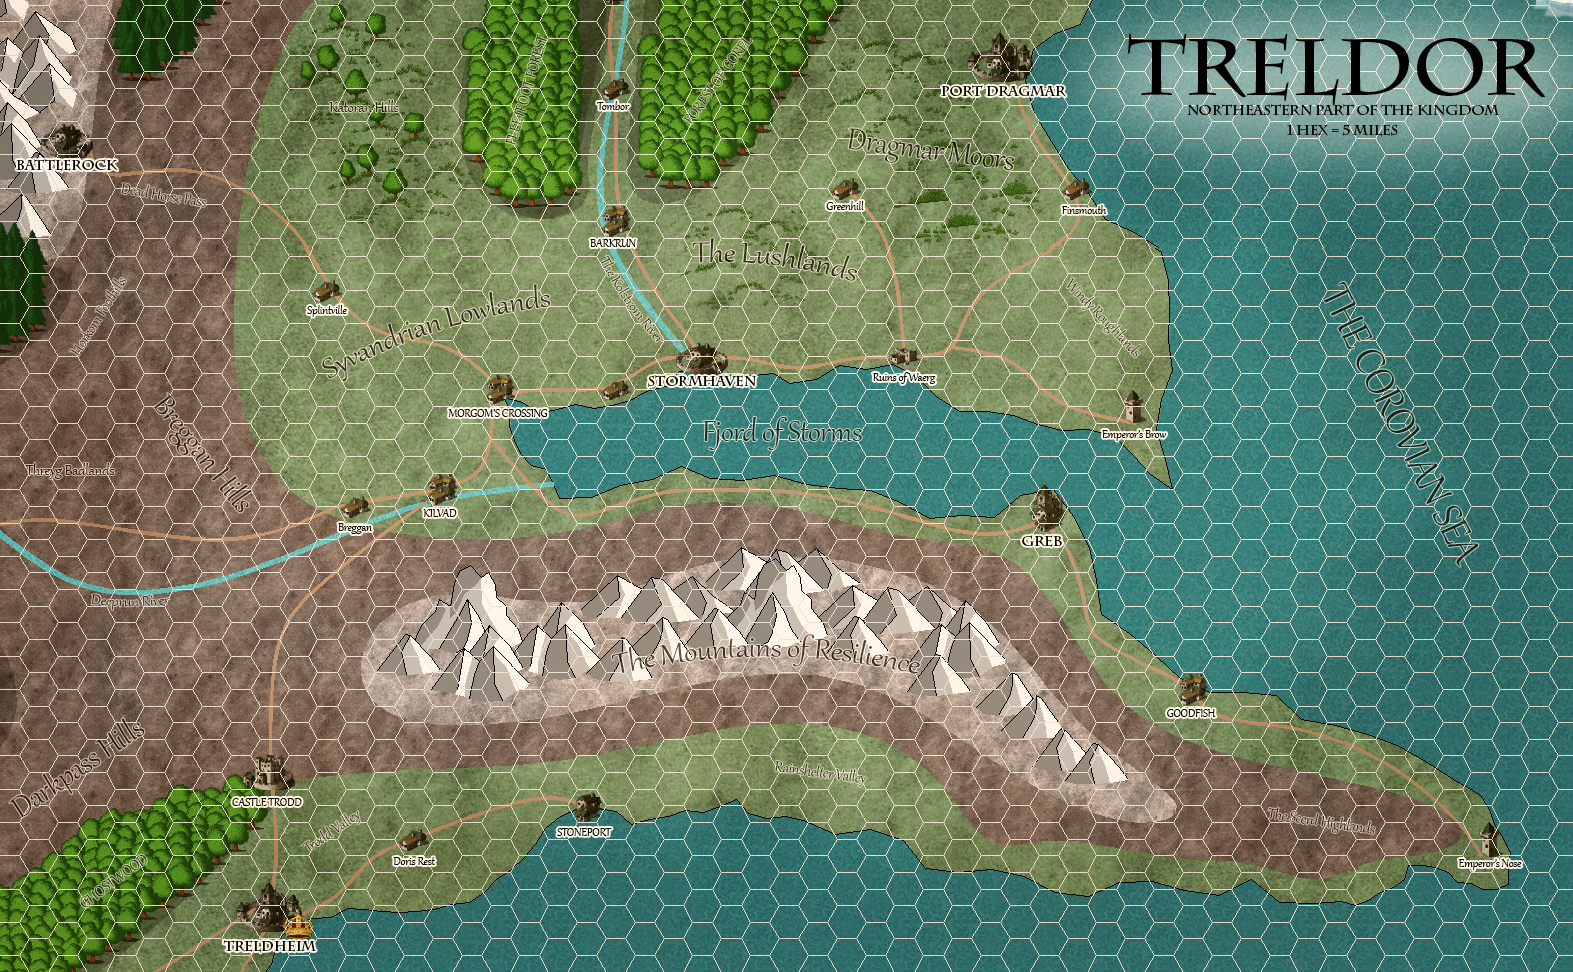 treldor_detail_NE.png